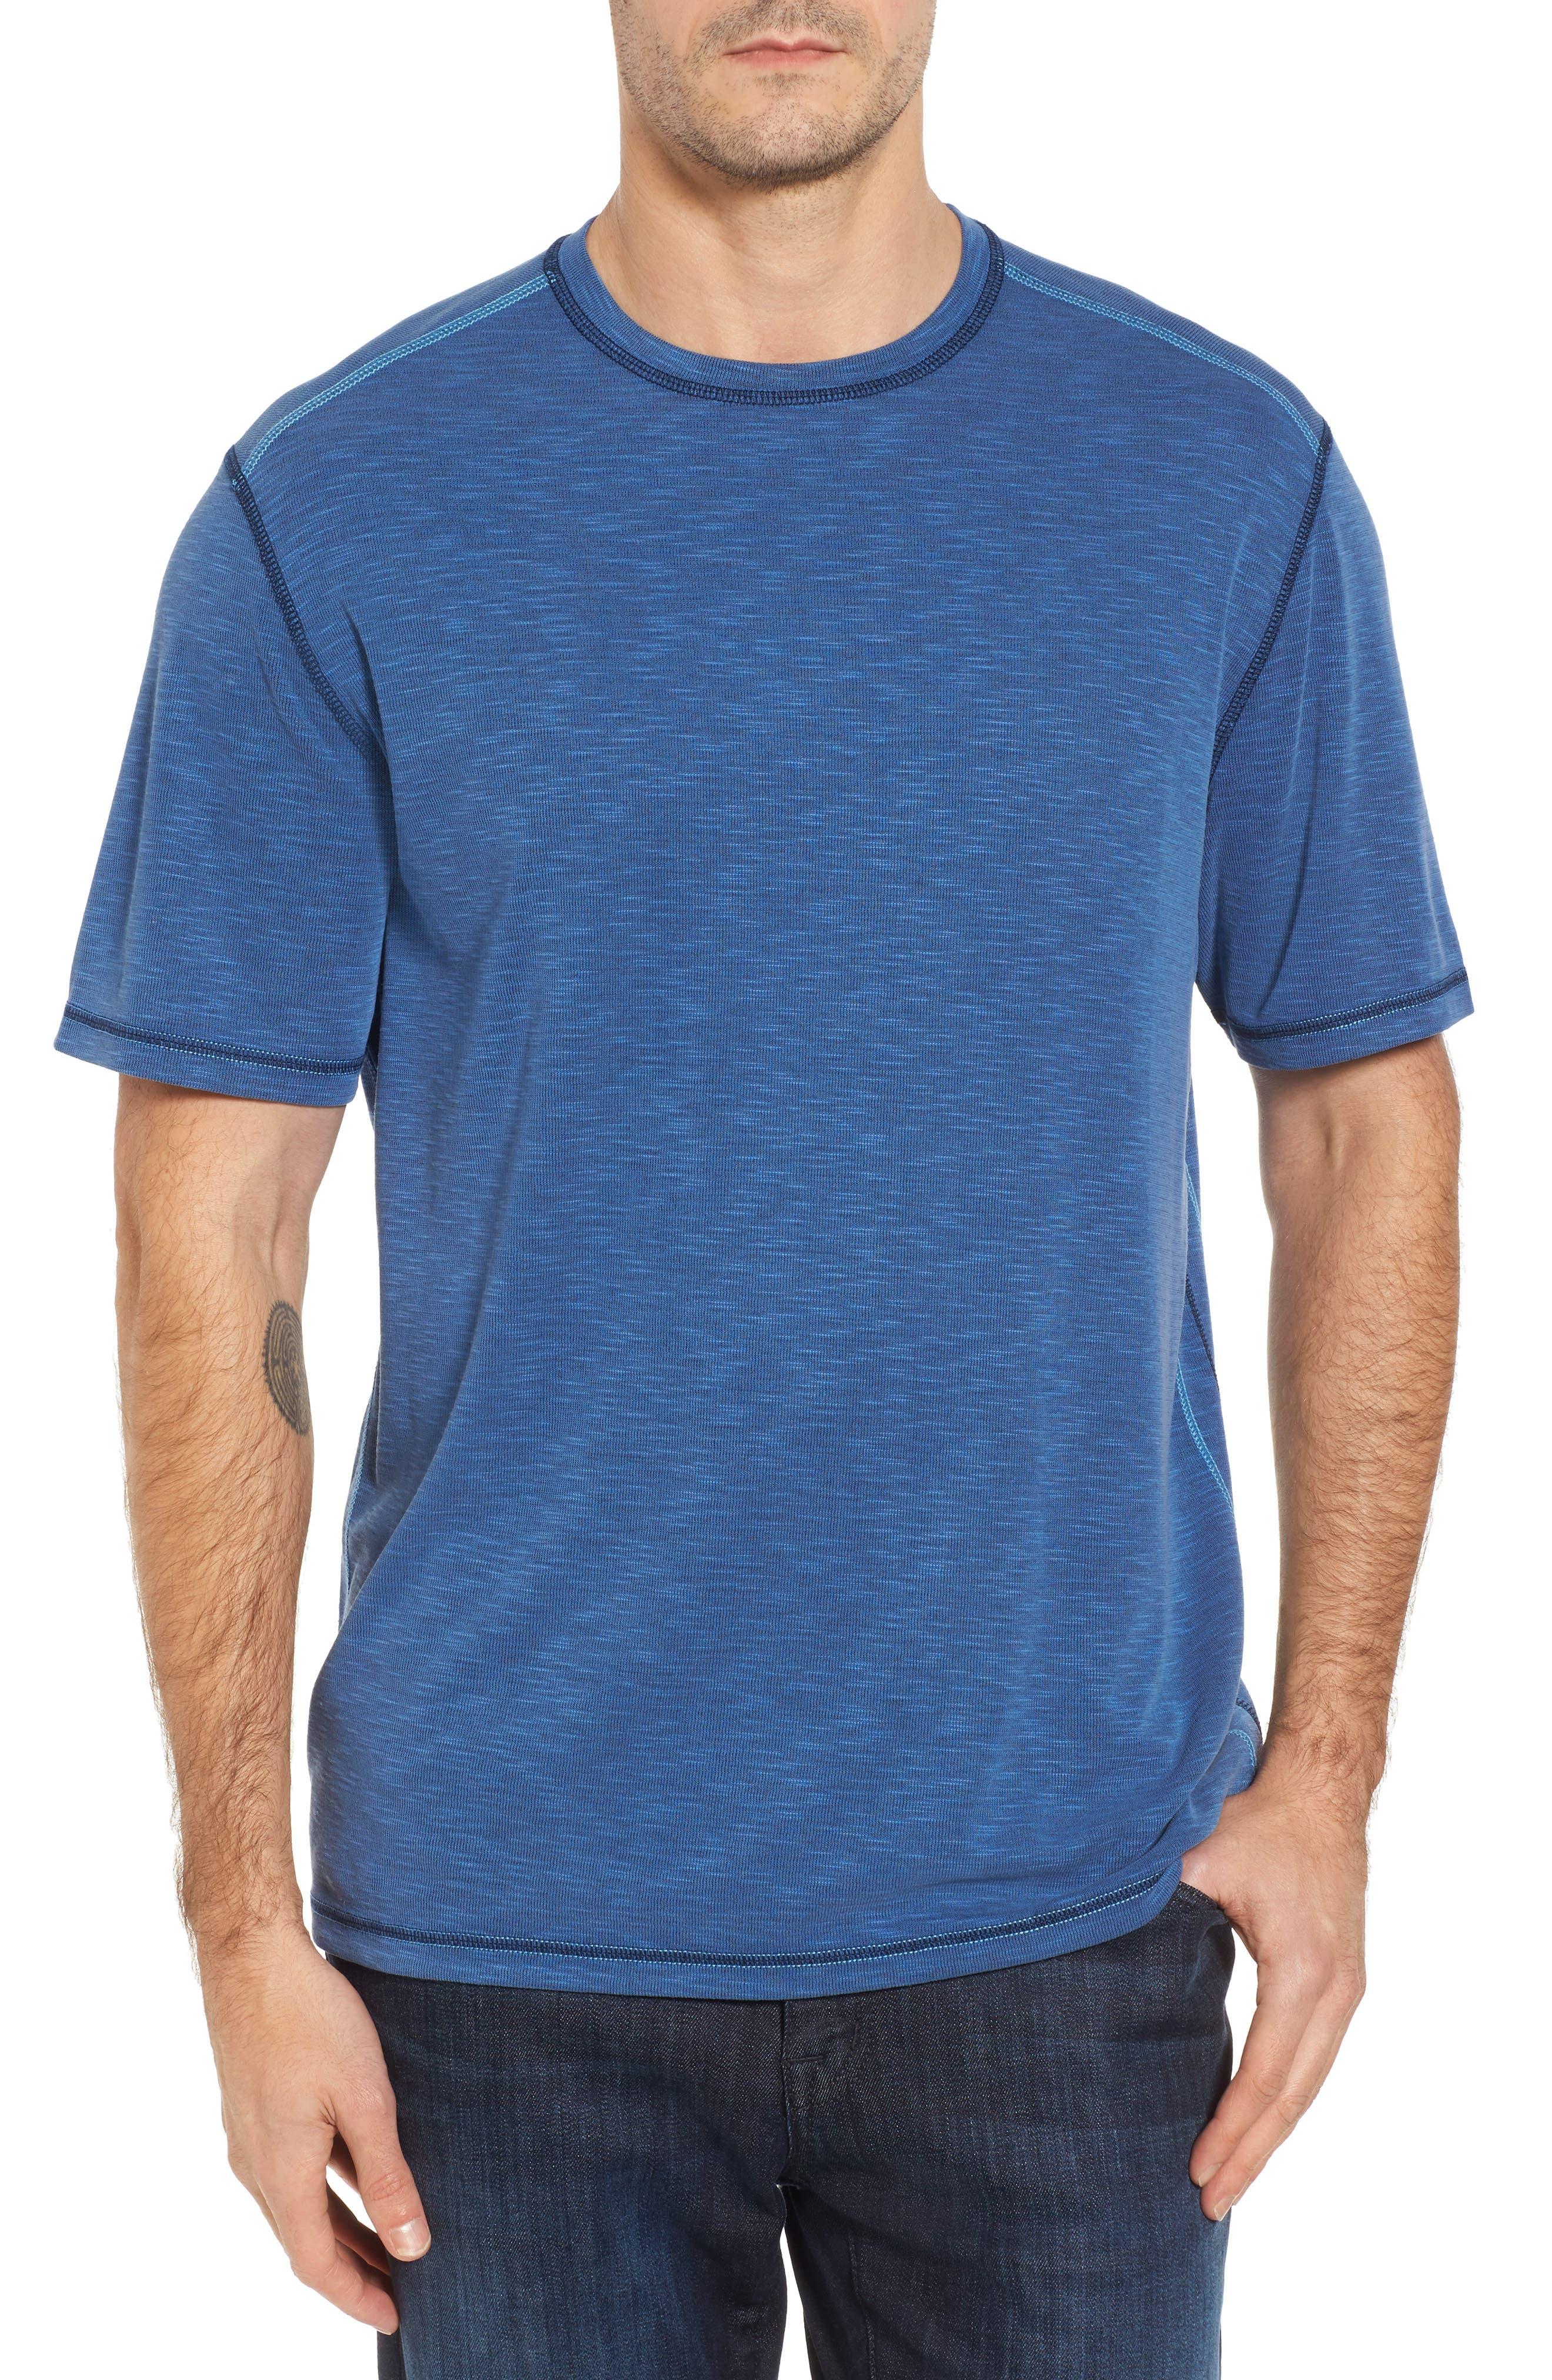 Flip Tide T-Shirt,                             Main thumbnail 1, color,                             Galaxy Blue